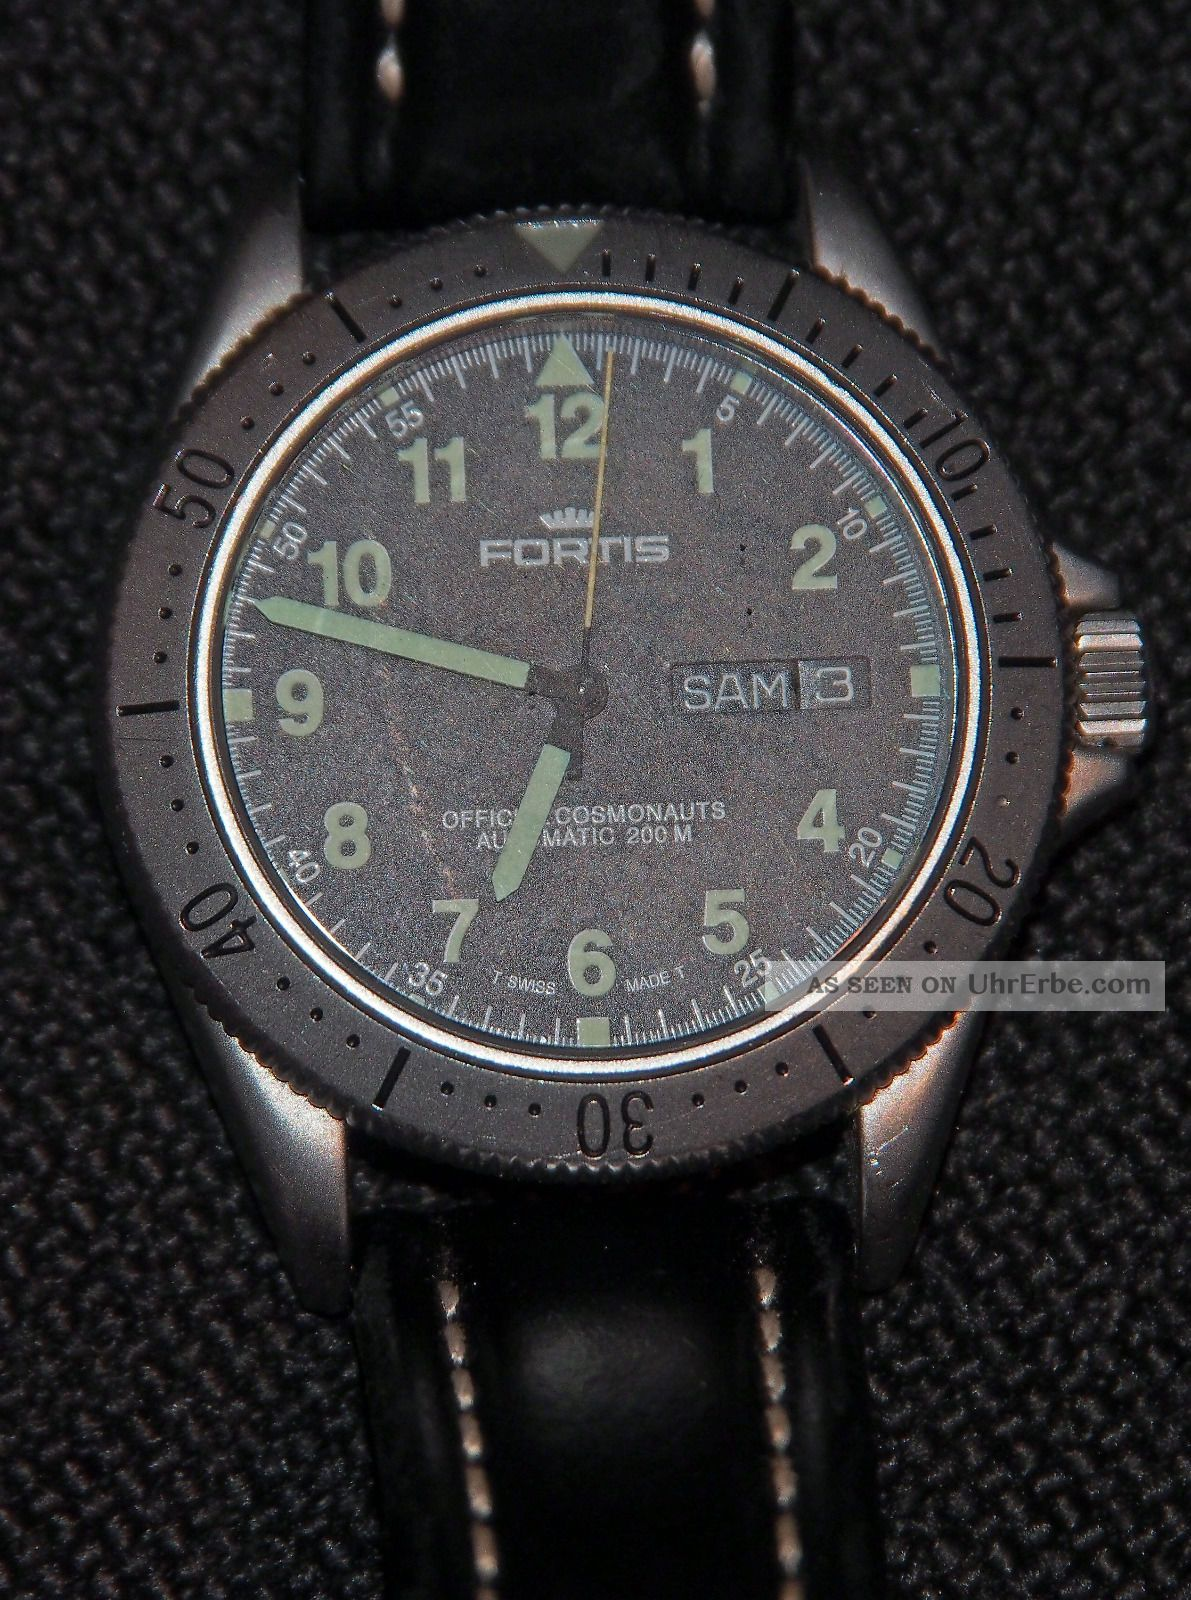 Fortis Official Cosmonauts Daydate Automatik 200 M Mit Papieren Armbanduhren Bild